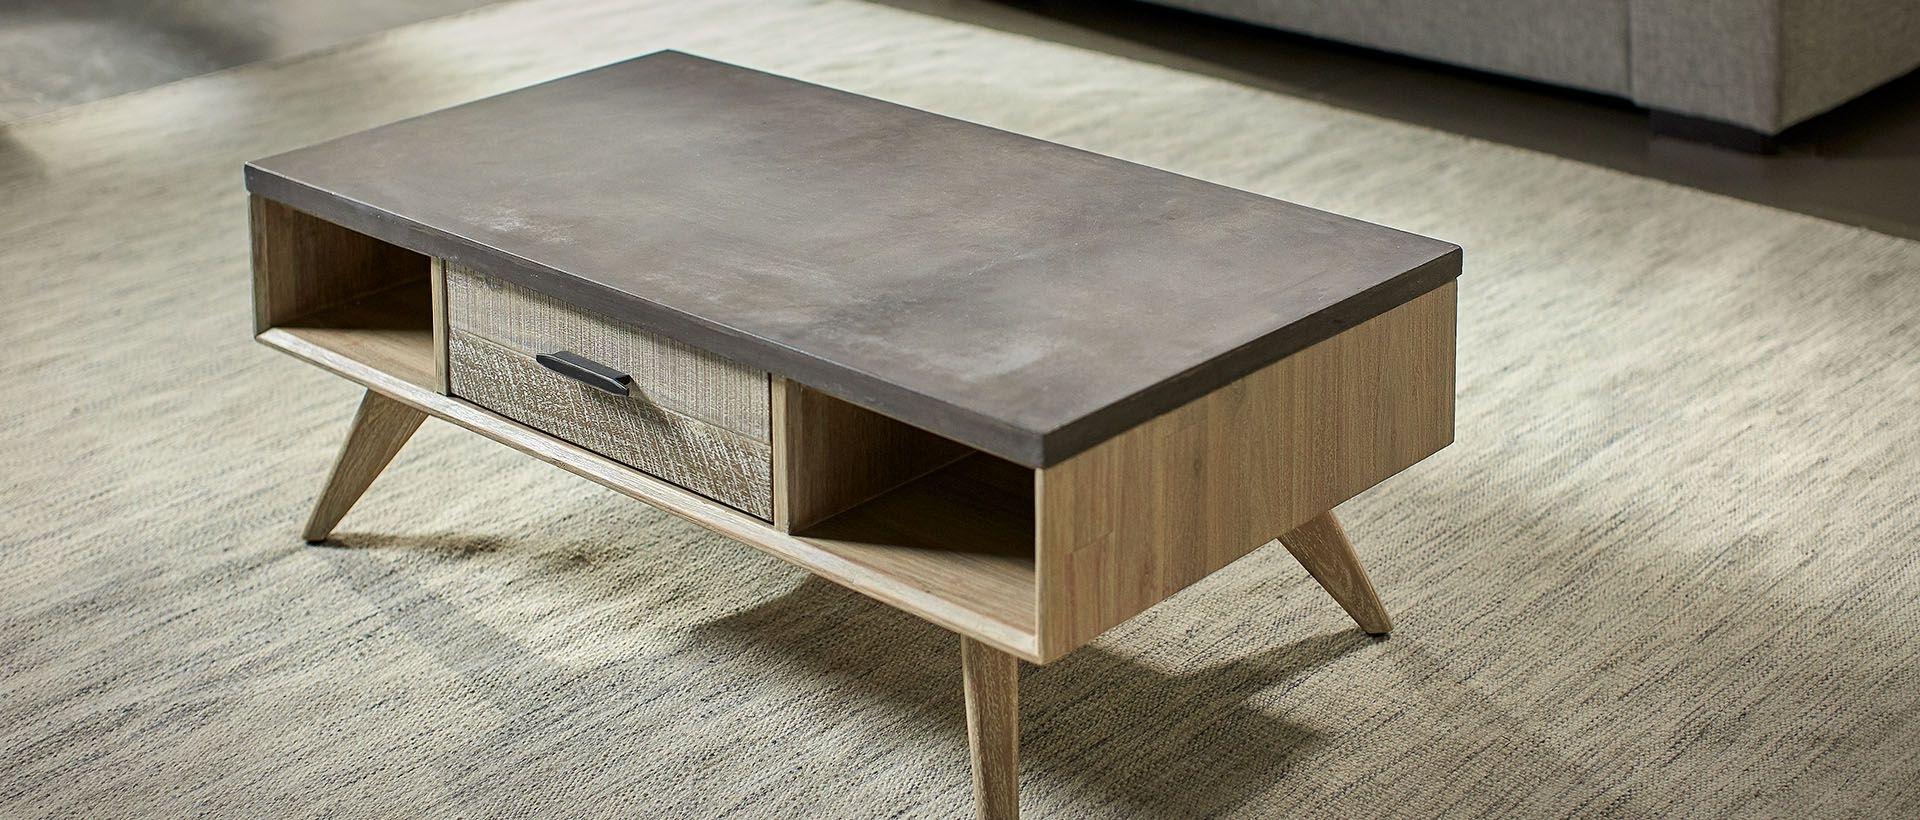 Nick Scali Furniture (View 14 of 20)